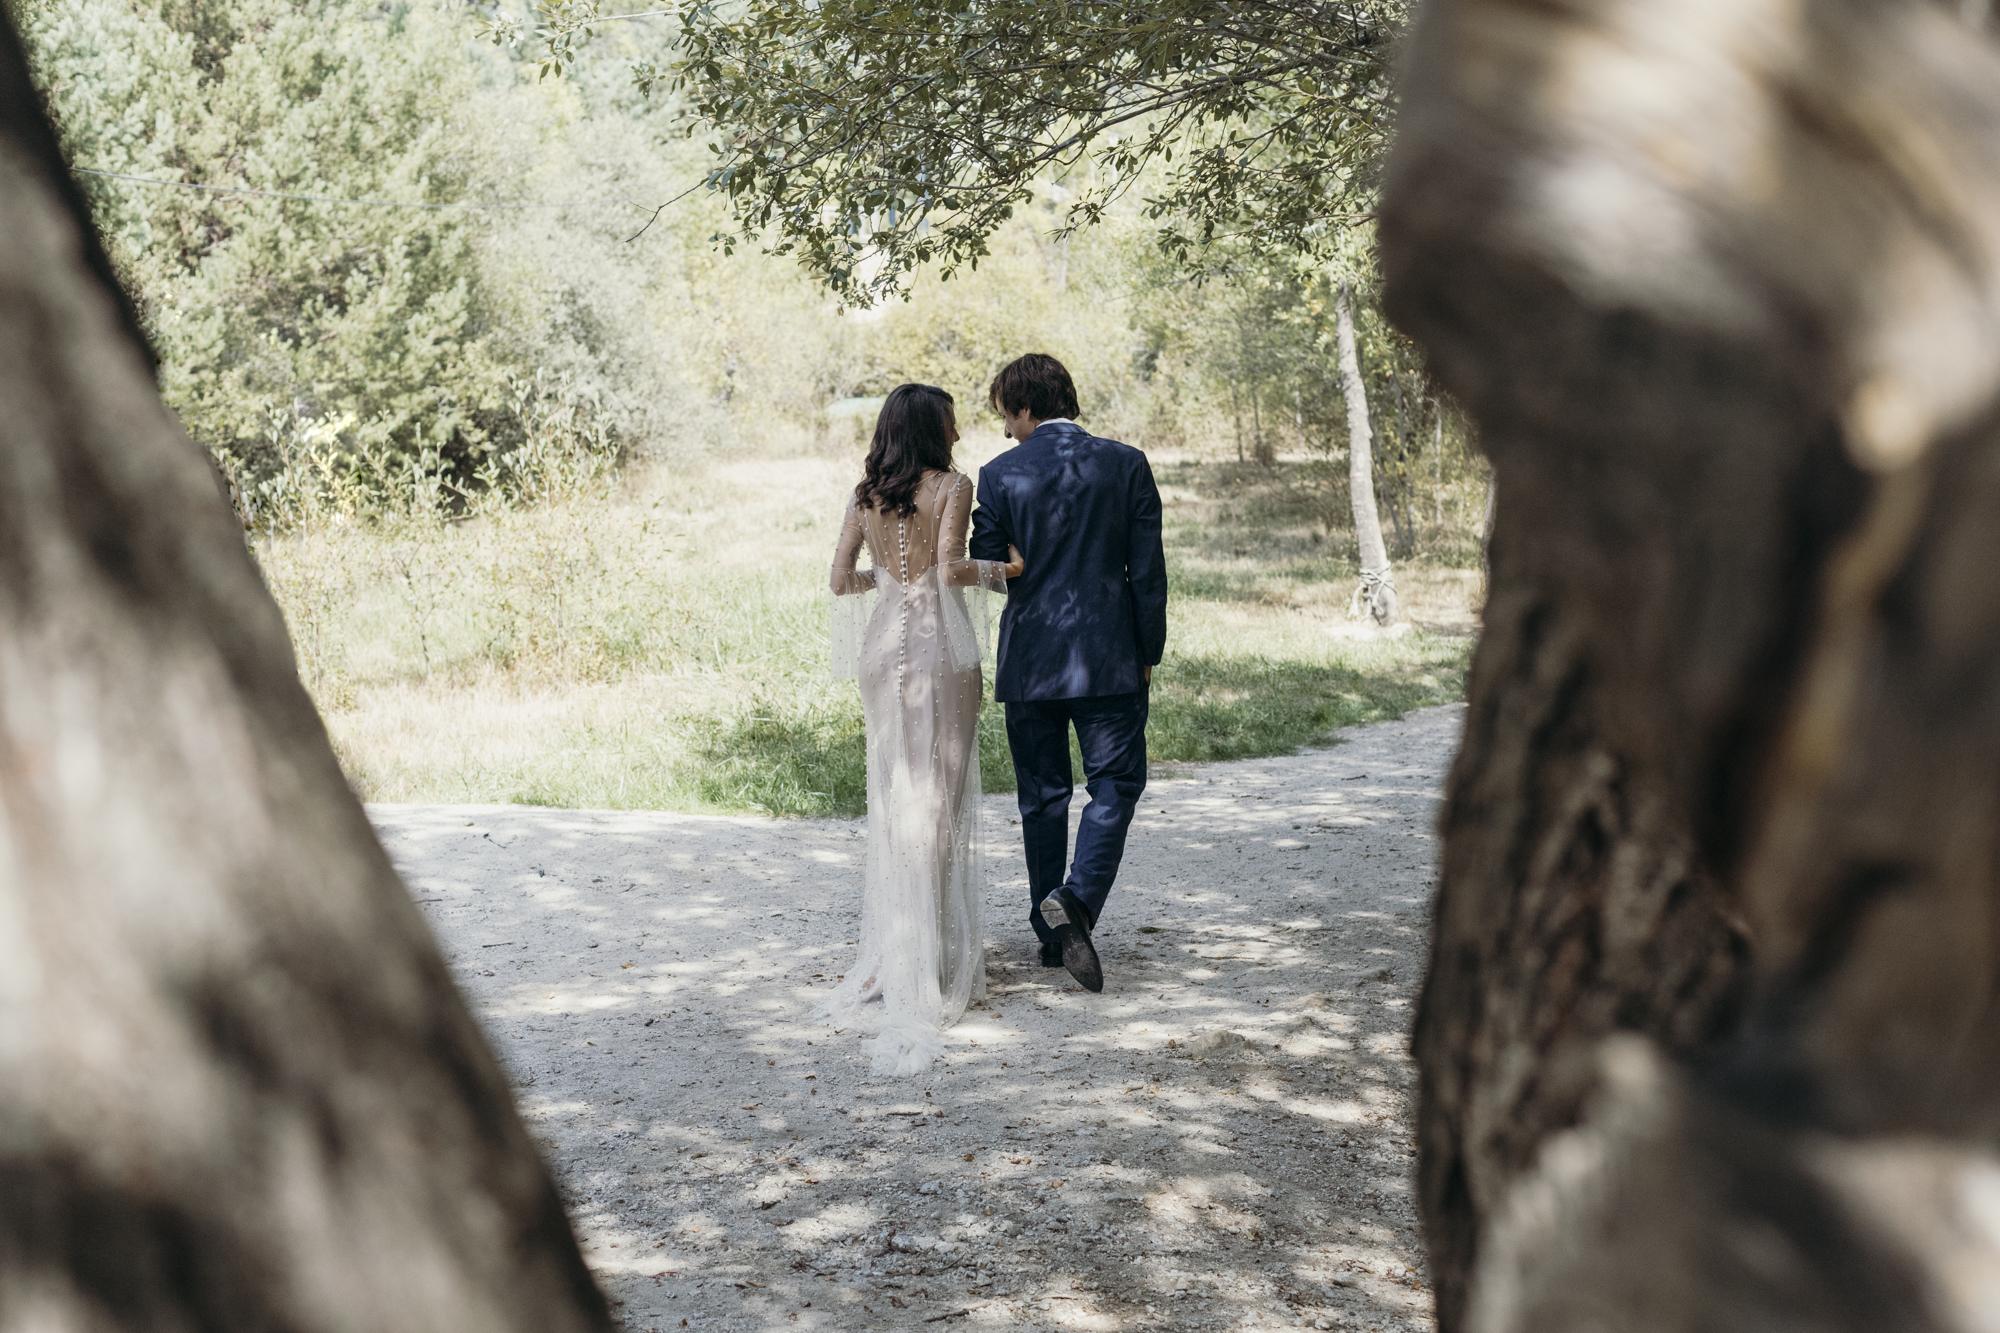 fotografía de boda Lucía de Haro